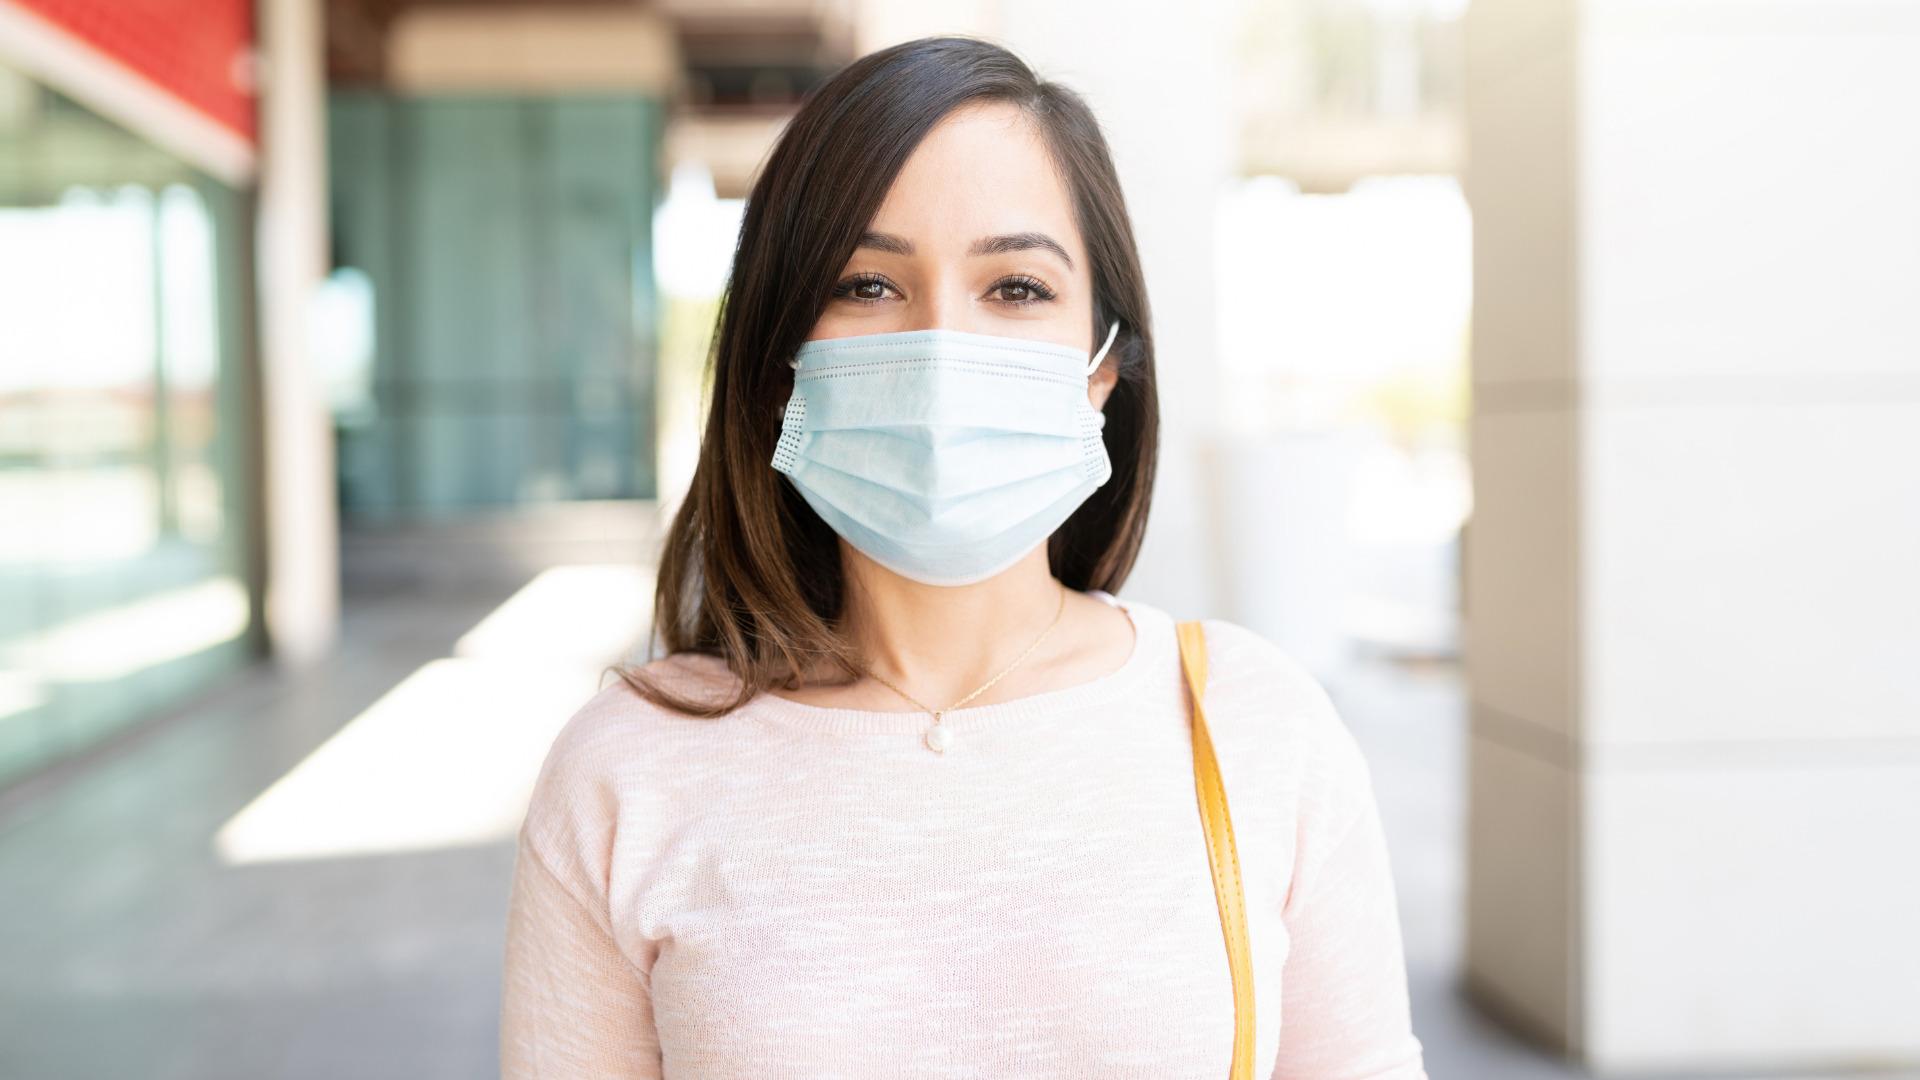 ecografia polmonare